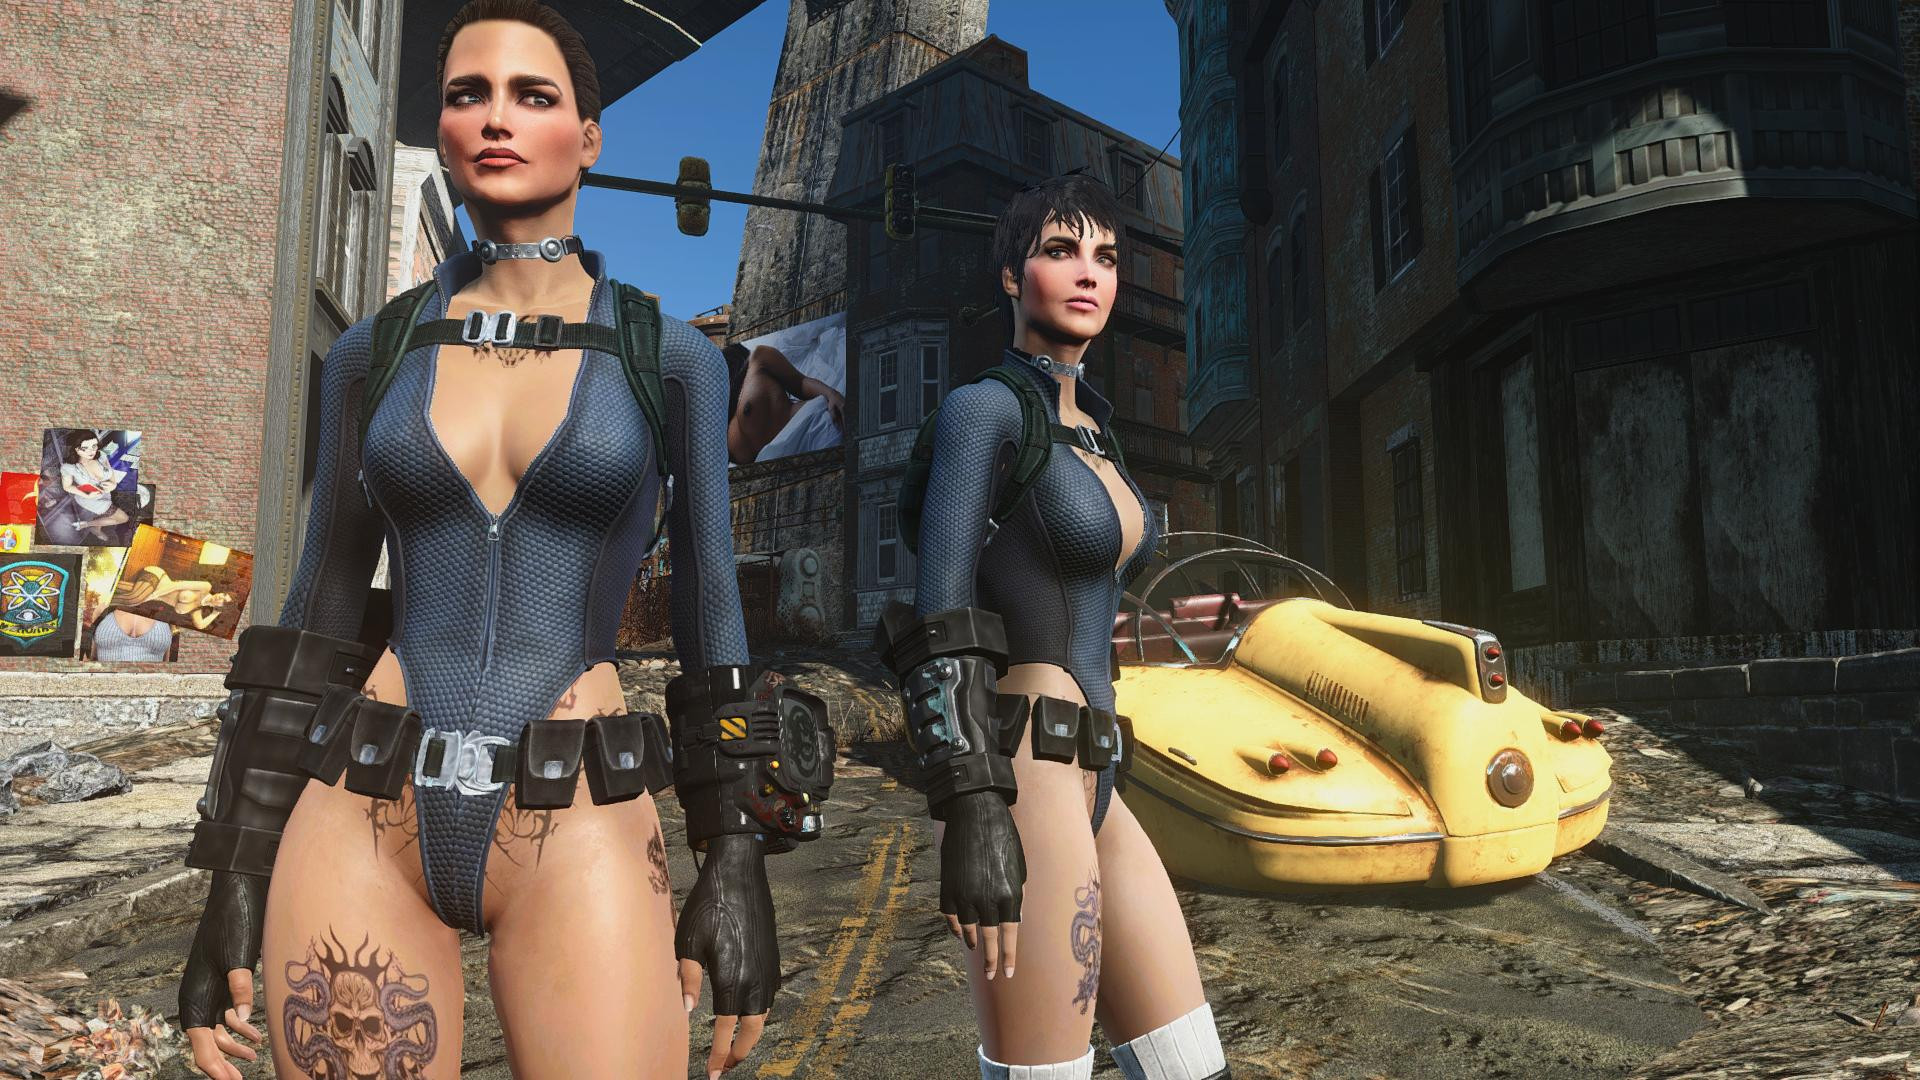 000600.Jpg - Fallout 4